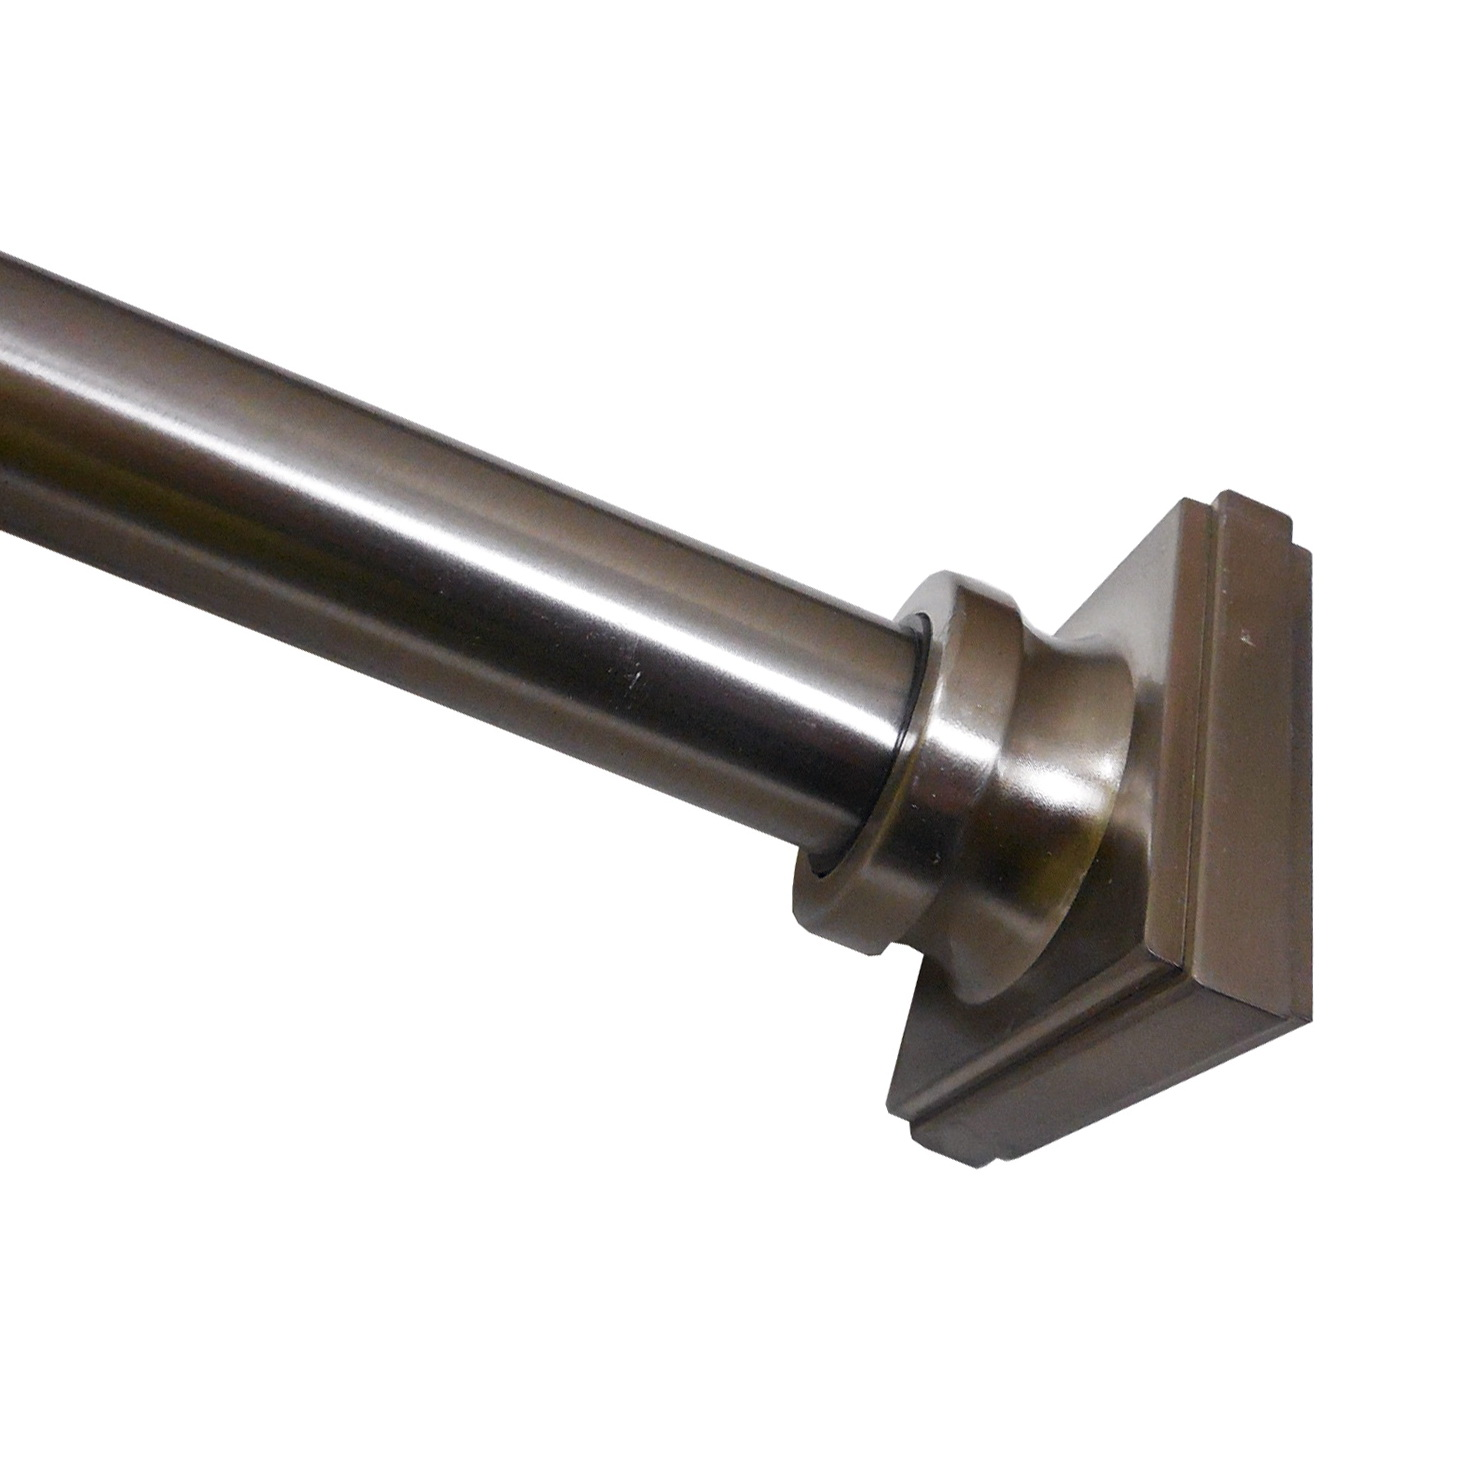 Adjustable Shower Curtain Rod South Africa Home Design Ideas